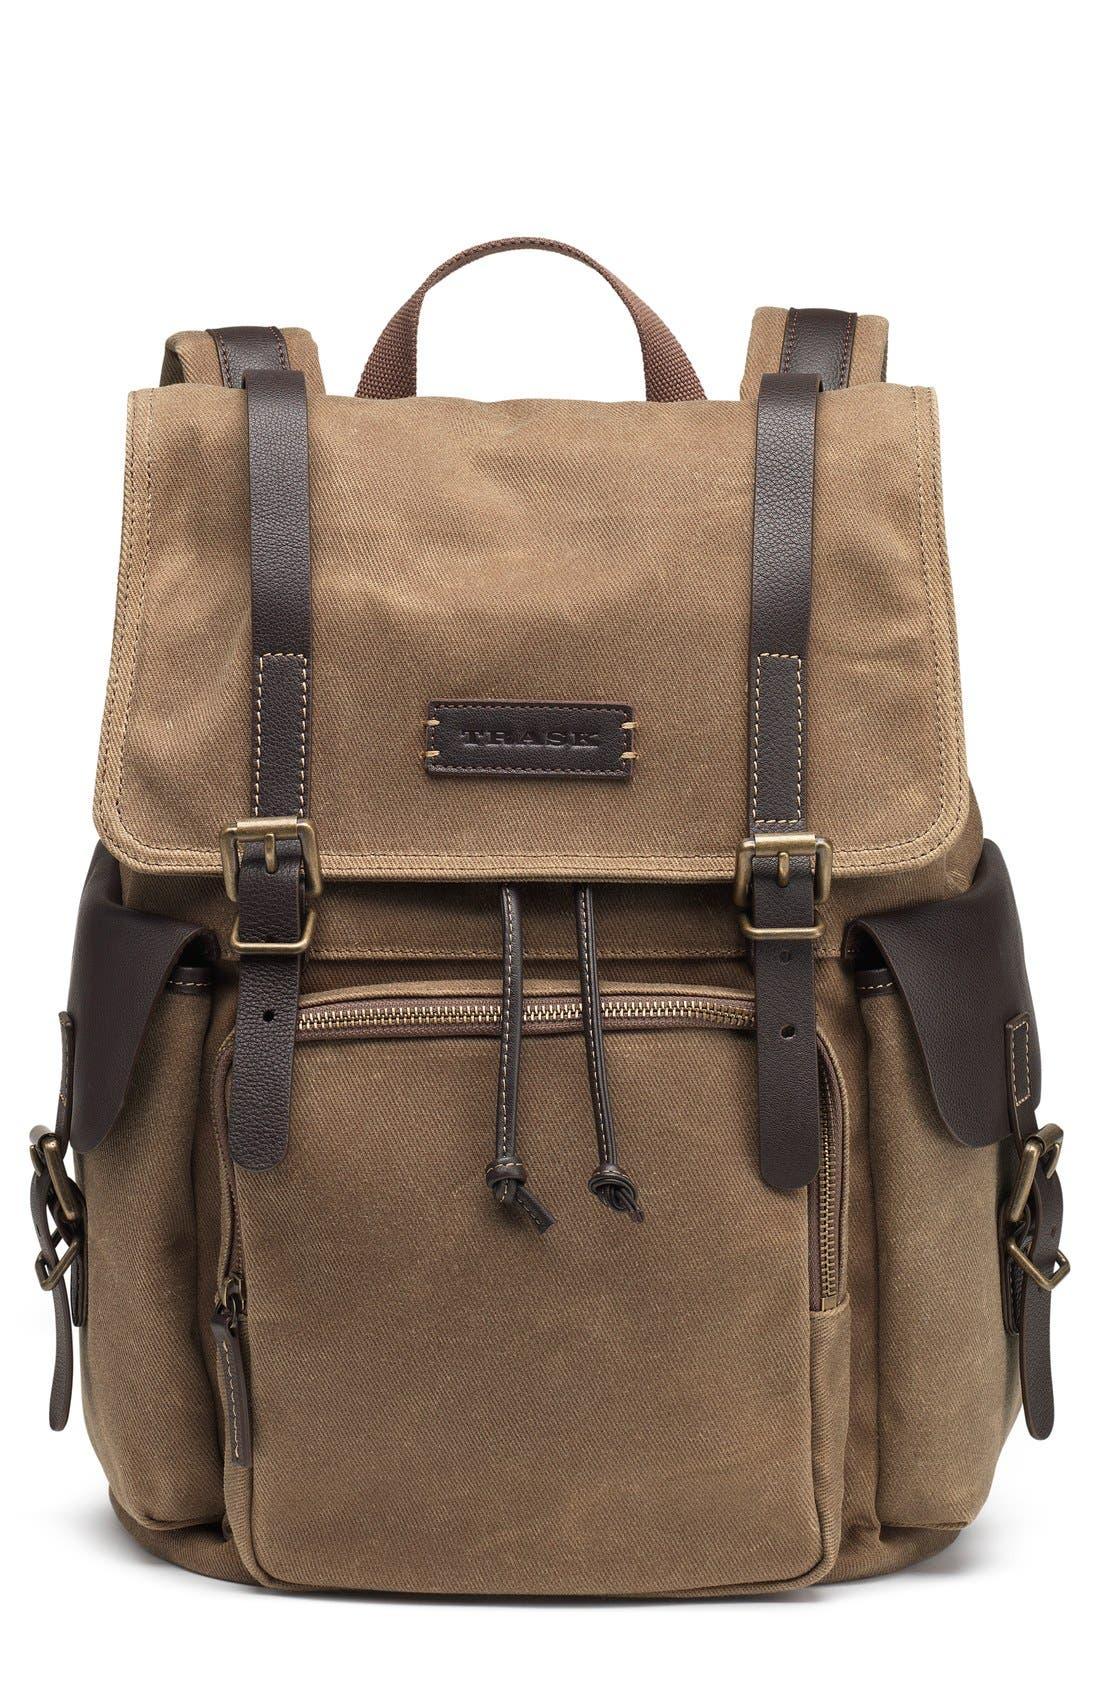 'Bridger' Waxed Canvas Backpack,                         Main,                         color, RANGER TAN